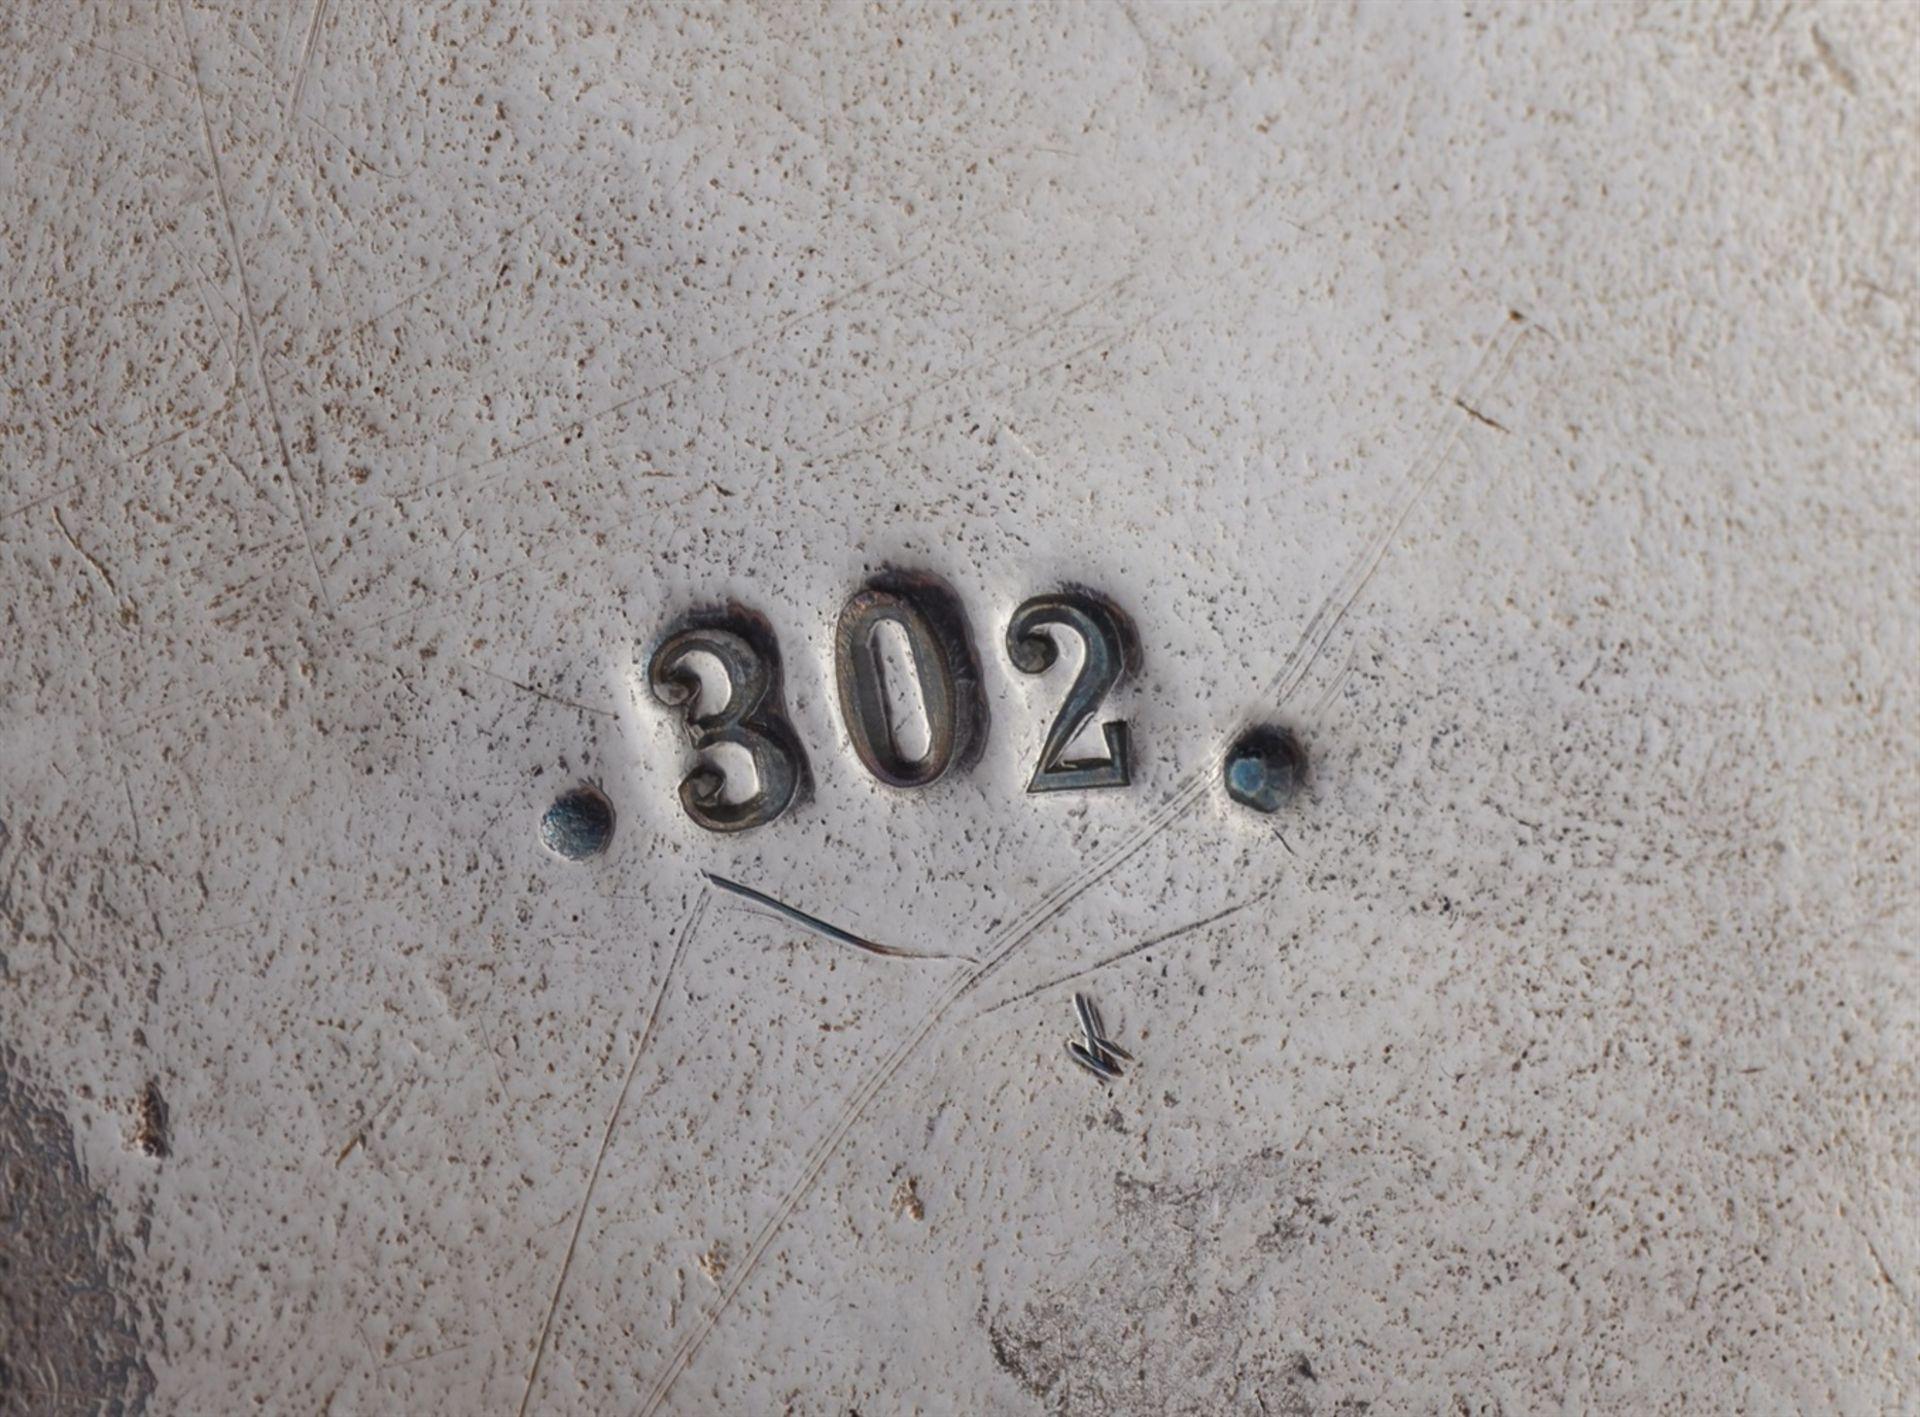 Los 744 - A rare Halle silver tankardSilver; with remains of gilding. Silver tankard with remnants of former